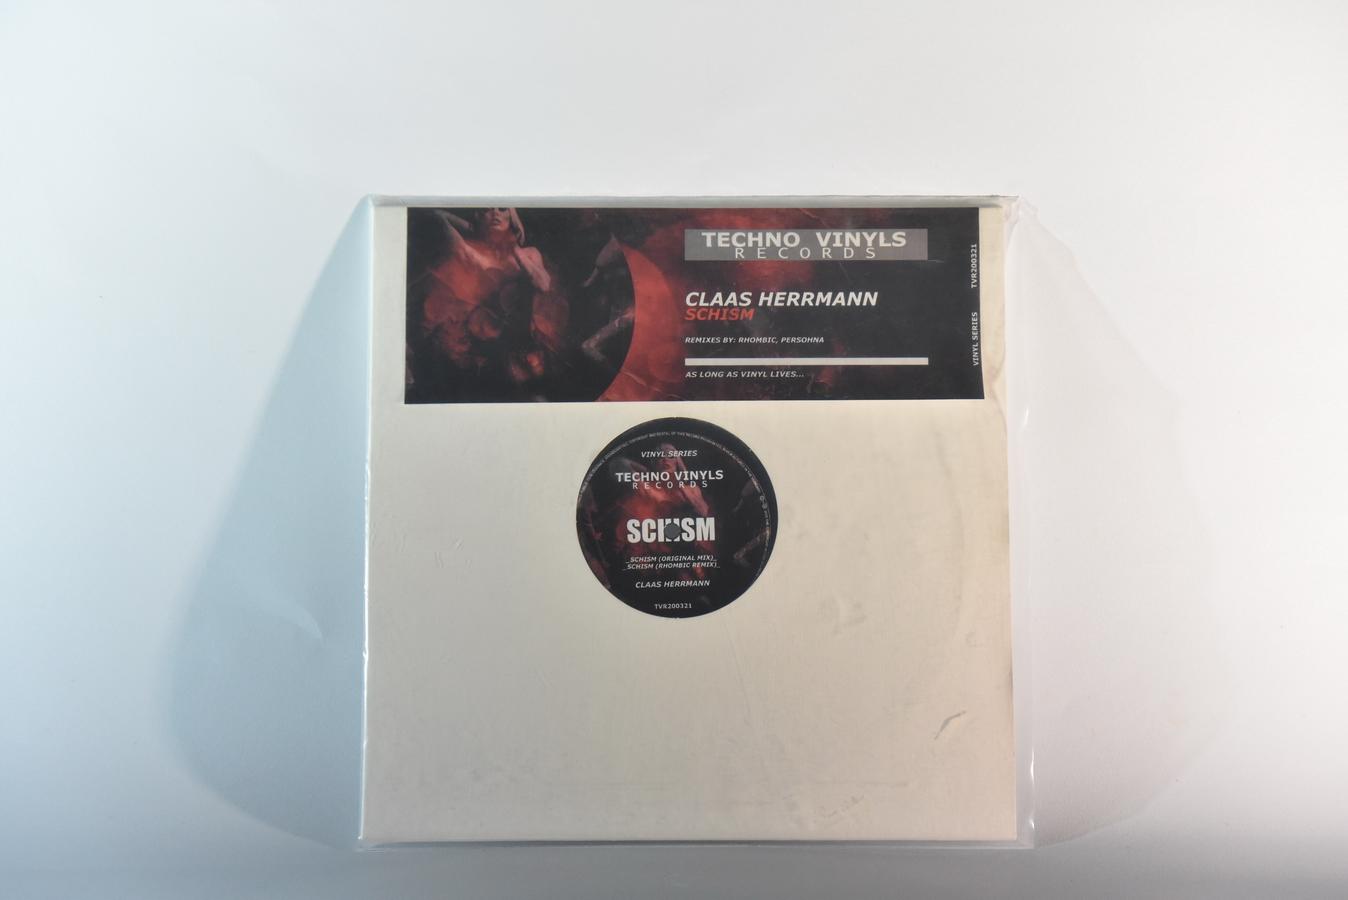 Claas Herrmann – Schism